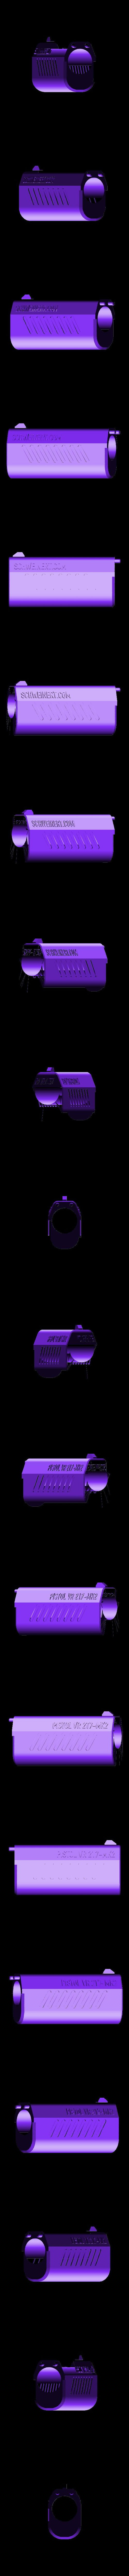 pistol_front_body.stl Download free STL file PISTOL VR magnetic gunstock Oculus Rift-S Quest • 3D printer template, danielschweinert